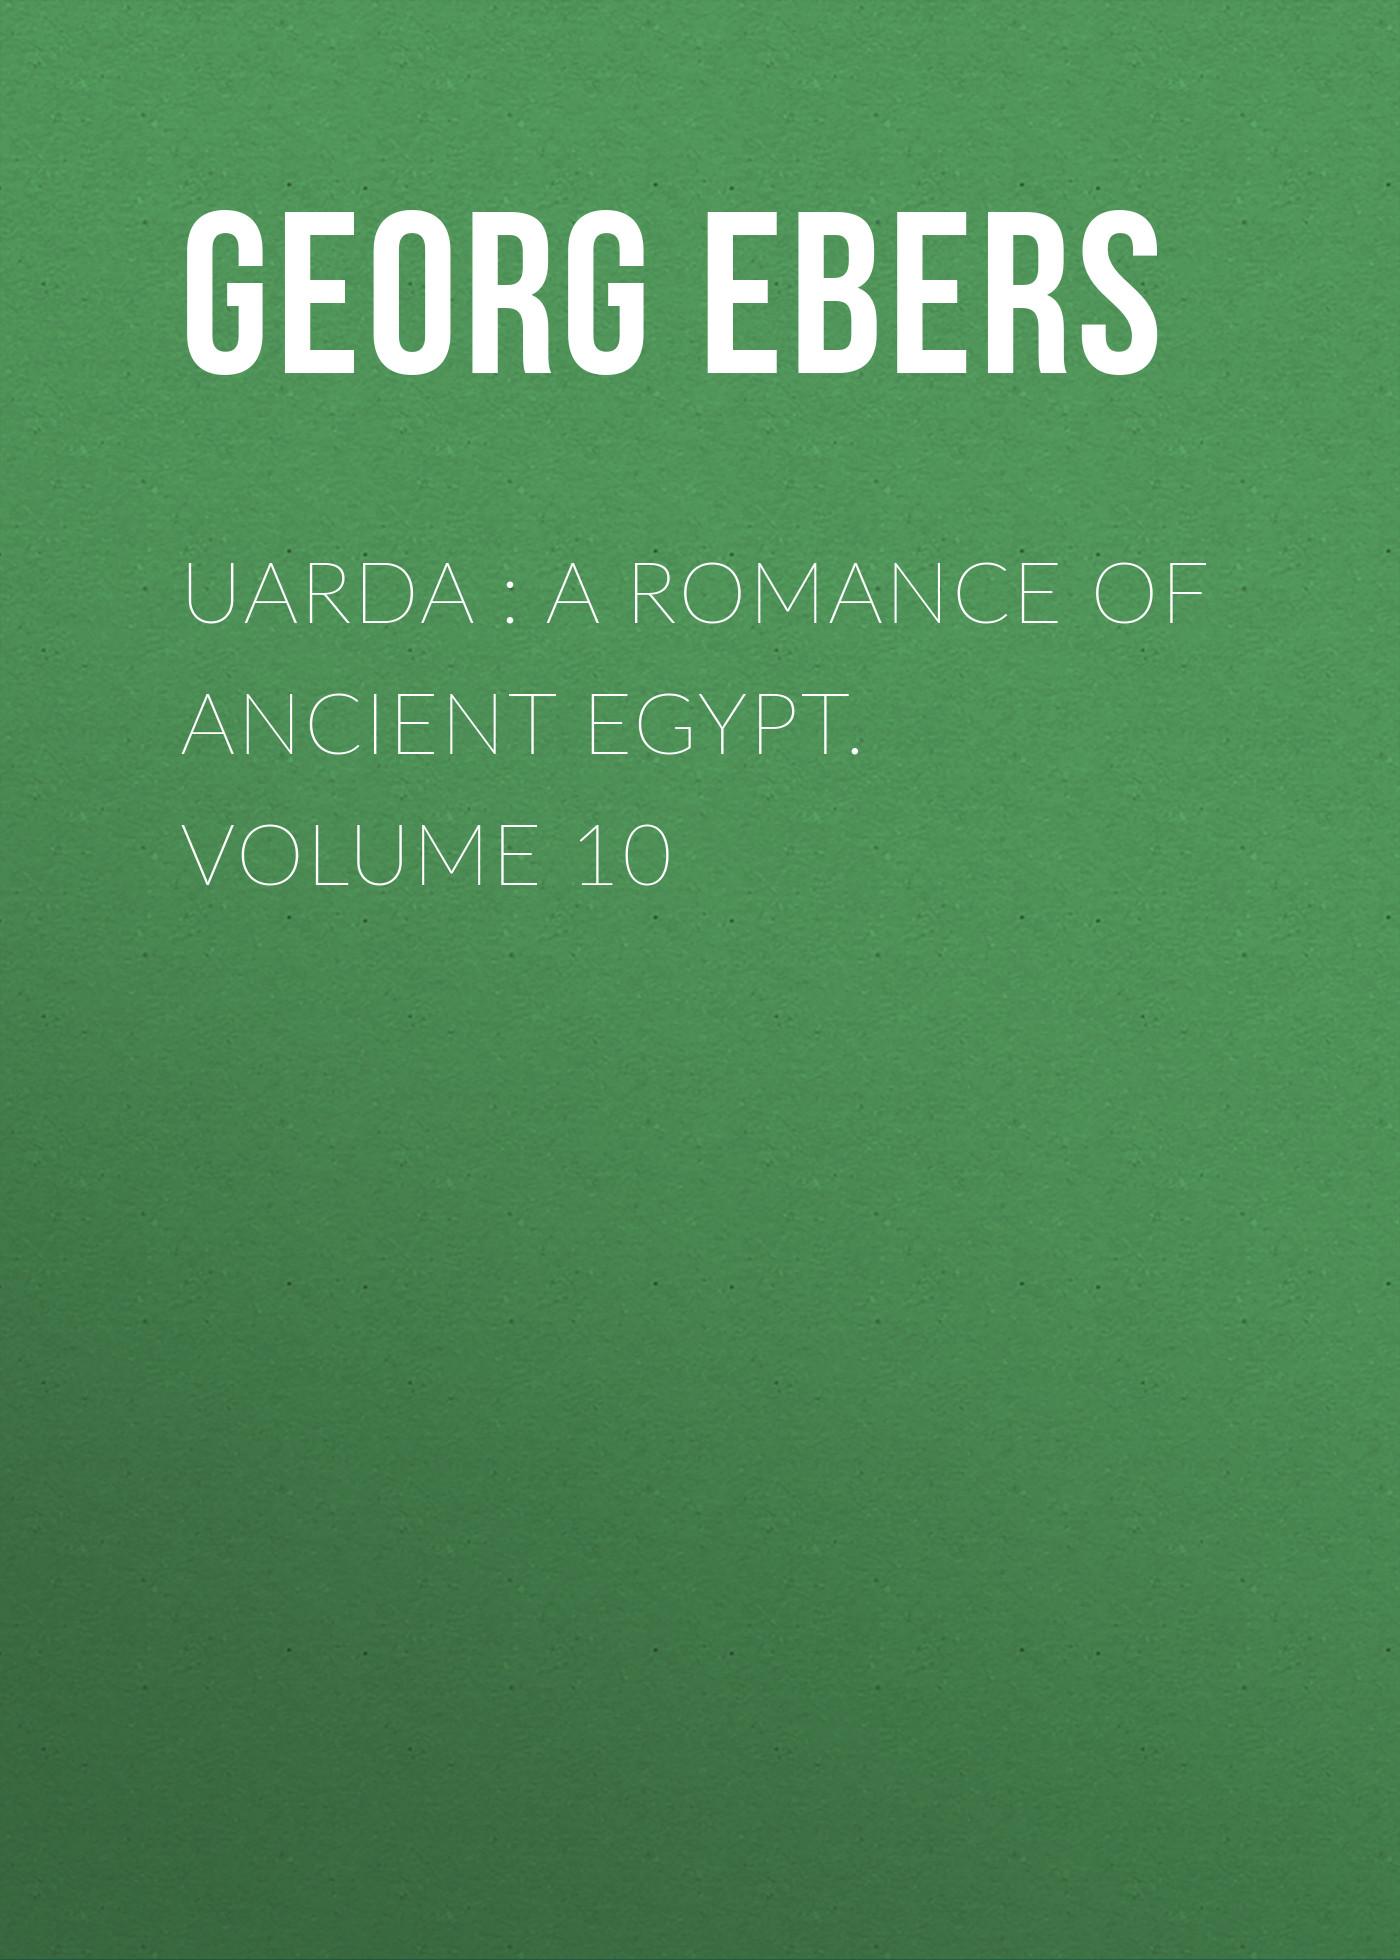 Georg Ebers Uarda : a Romance of Ancient Egypt. Volume 10 ancient egypt